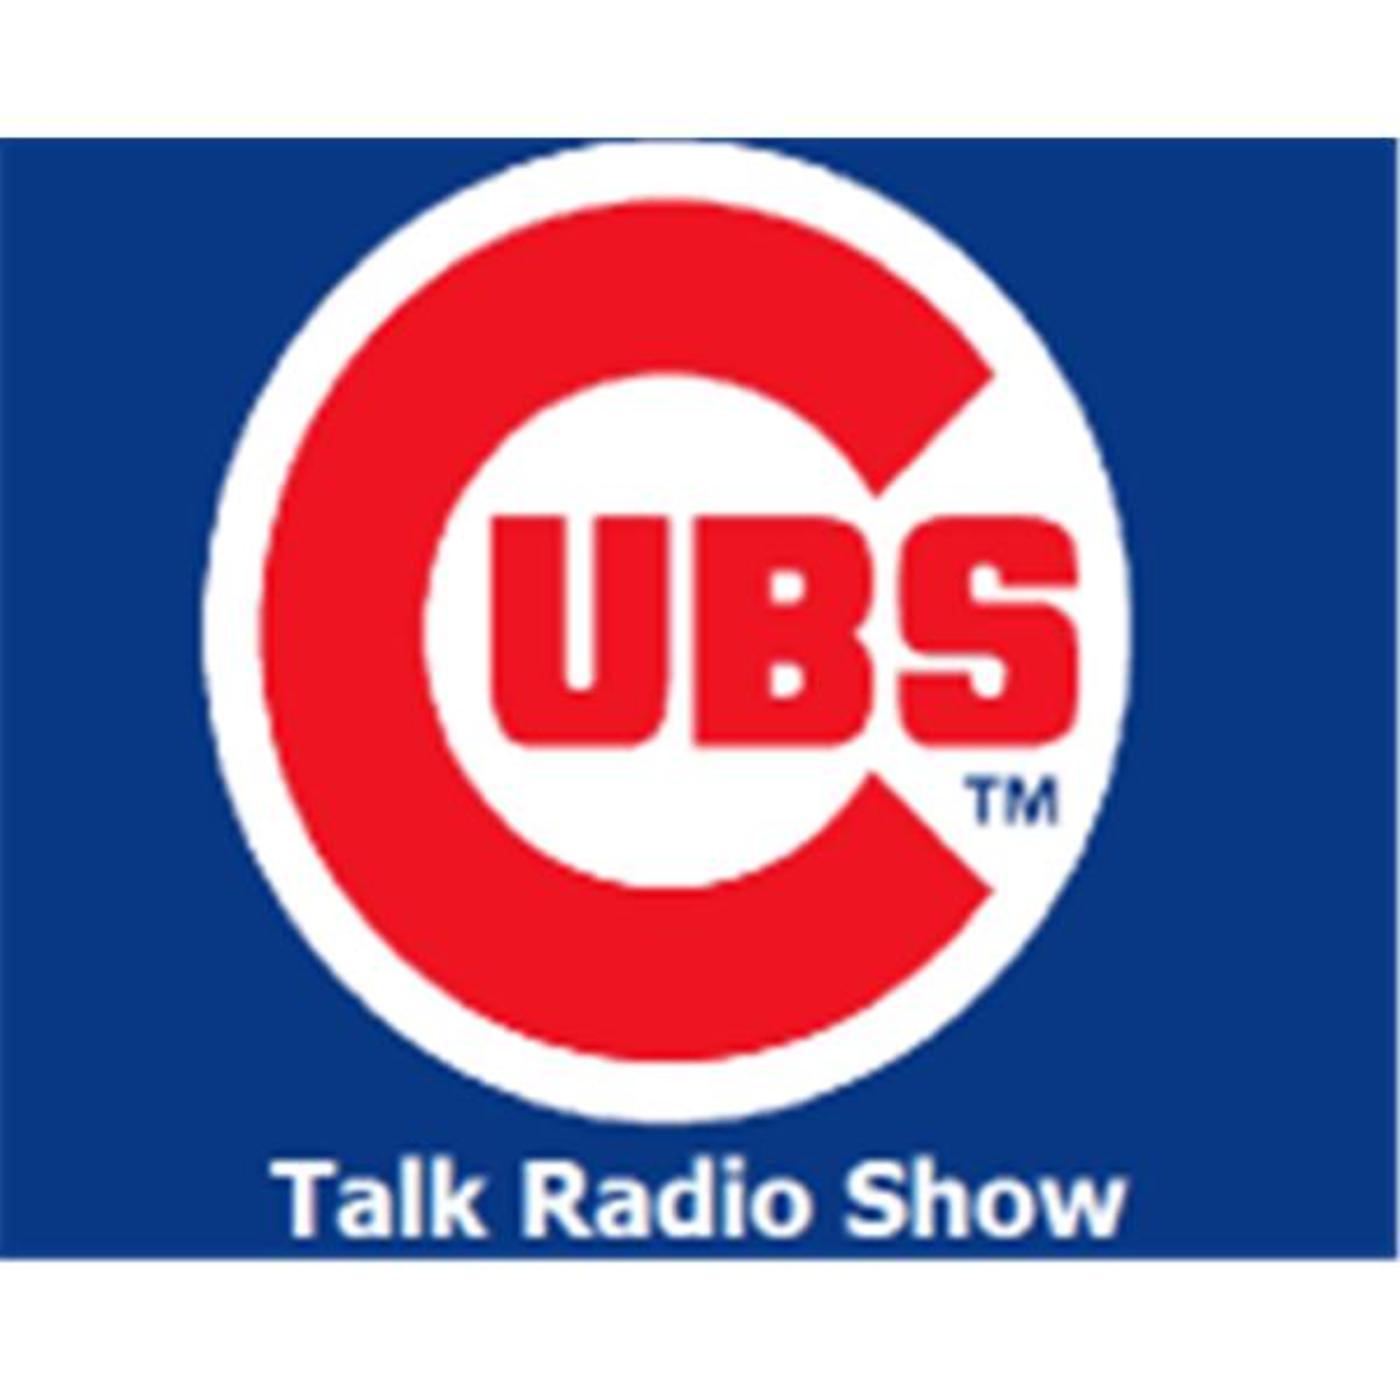 Cubs Talk Radio